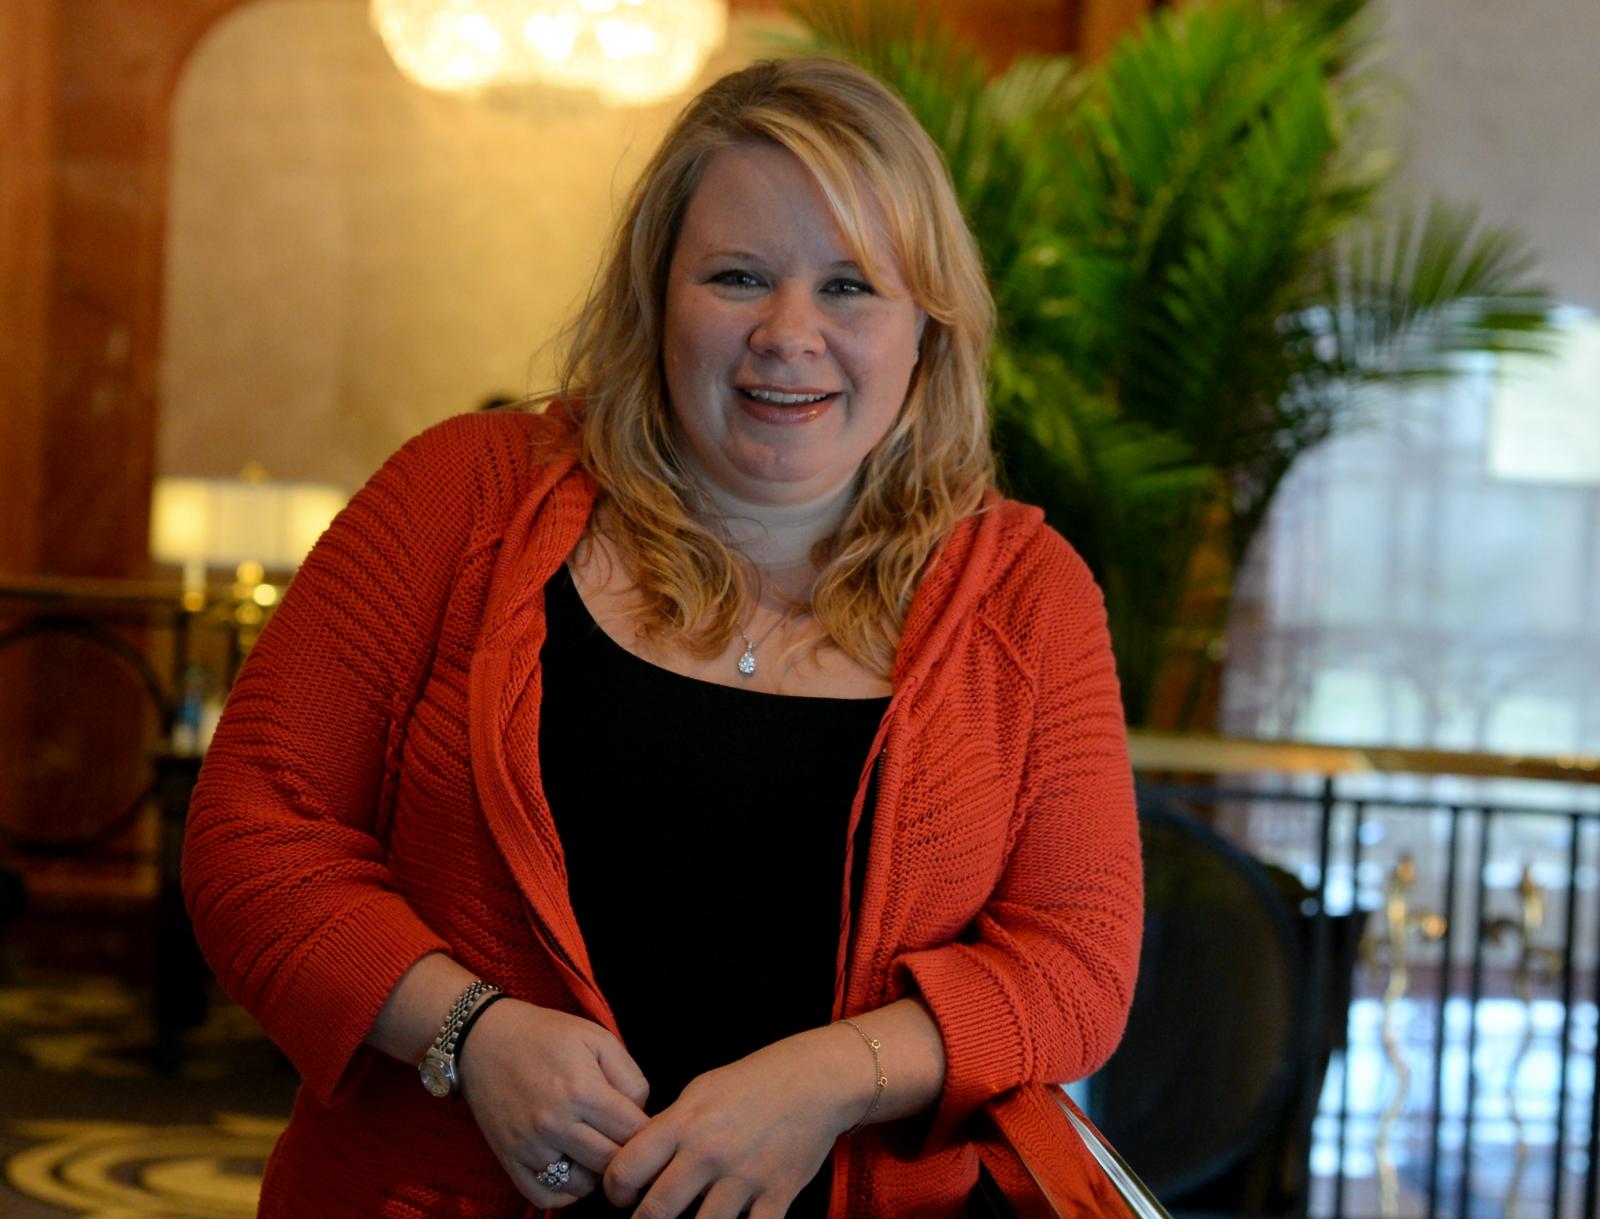 The Vampire Diaries Creator Julie Plec